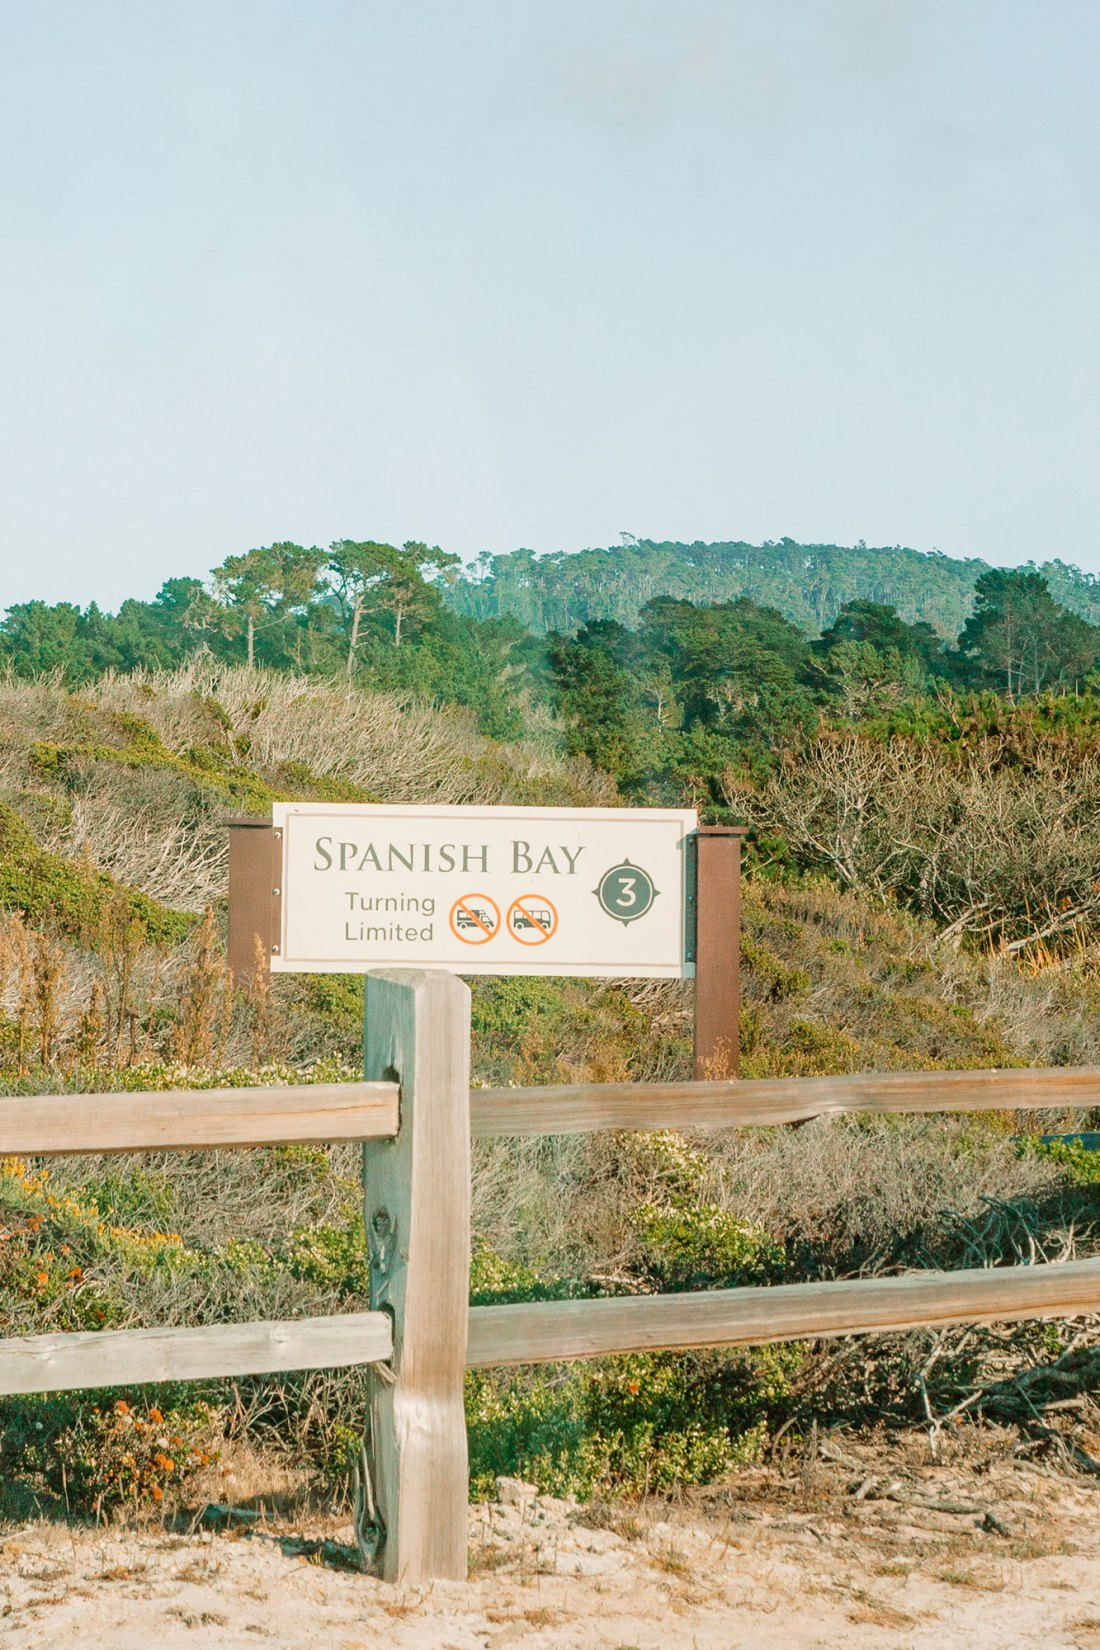 Spanish Bay Beach in 17-Mile Drive Monterey, California